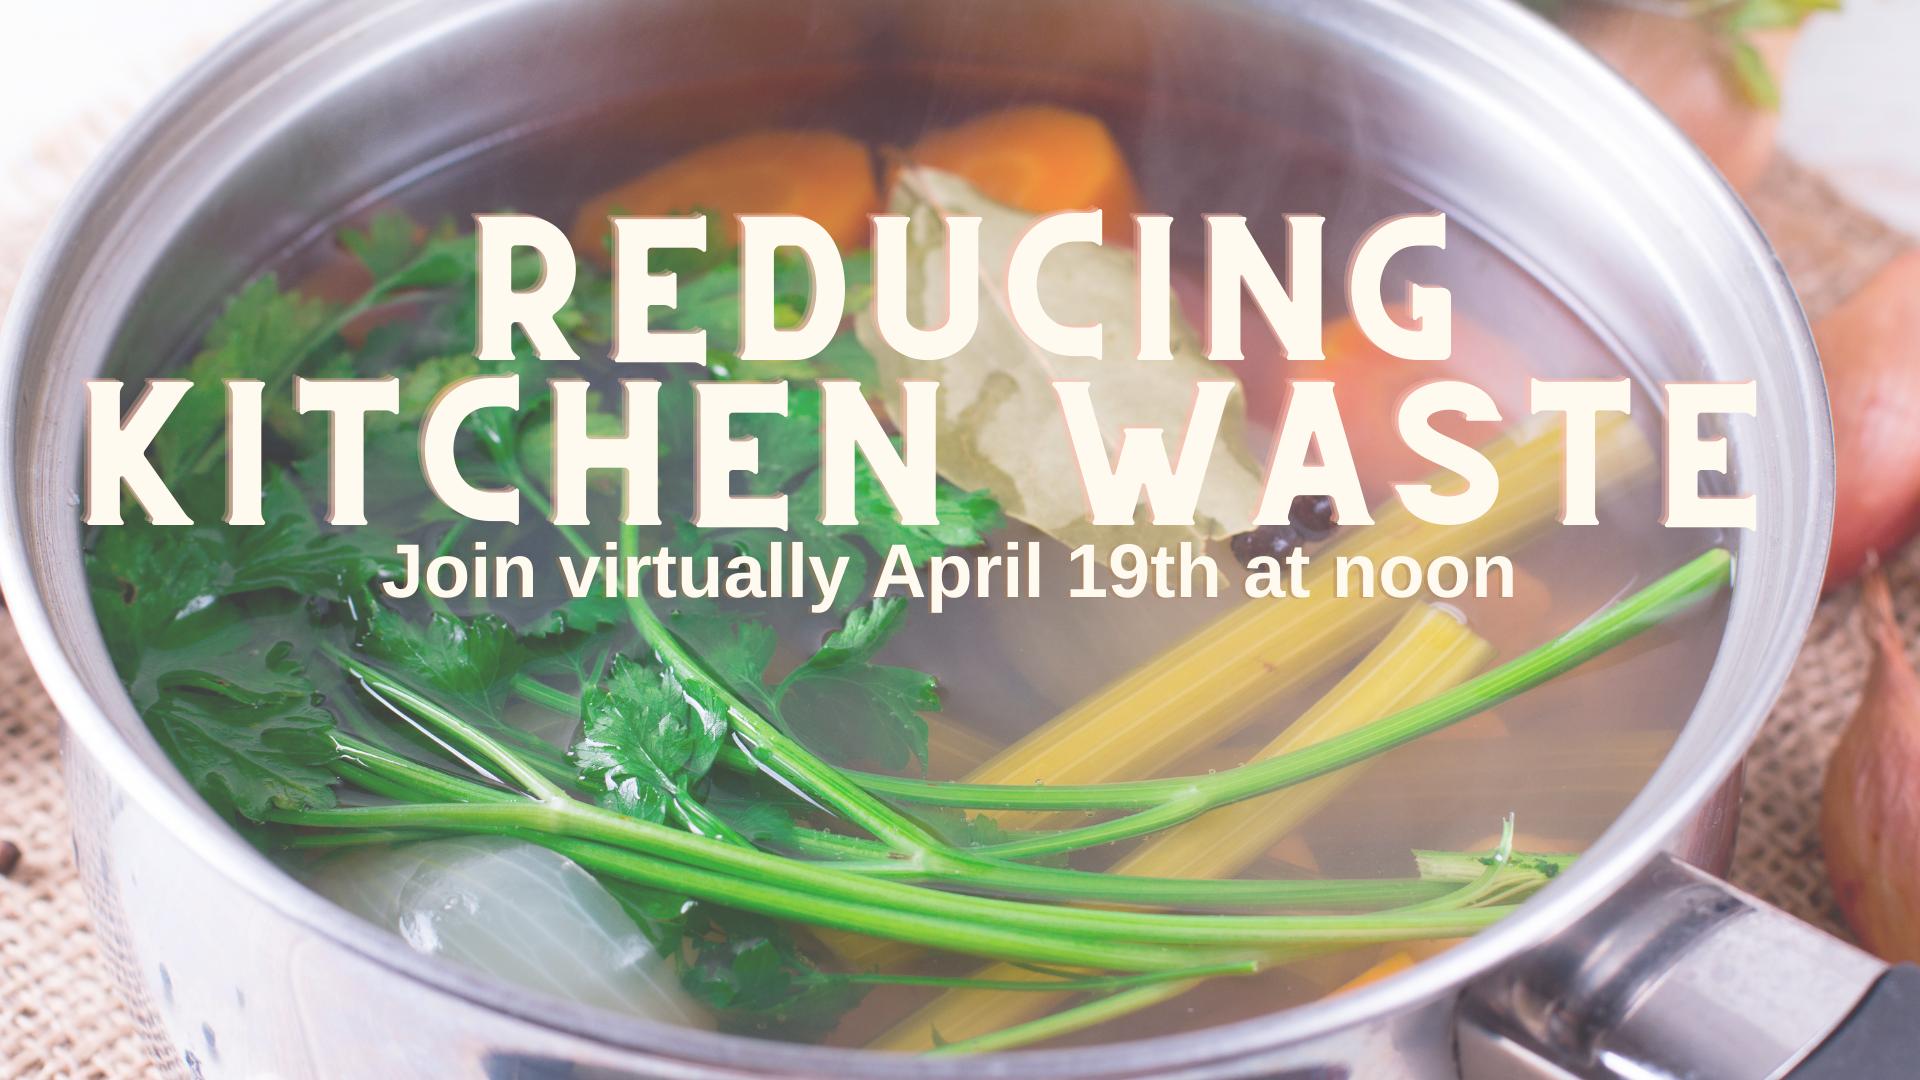 cooking pot with kitchen scraps advertising Kitchen Waste Program